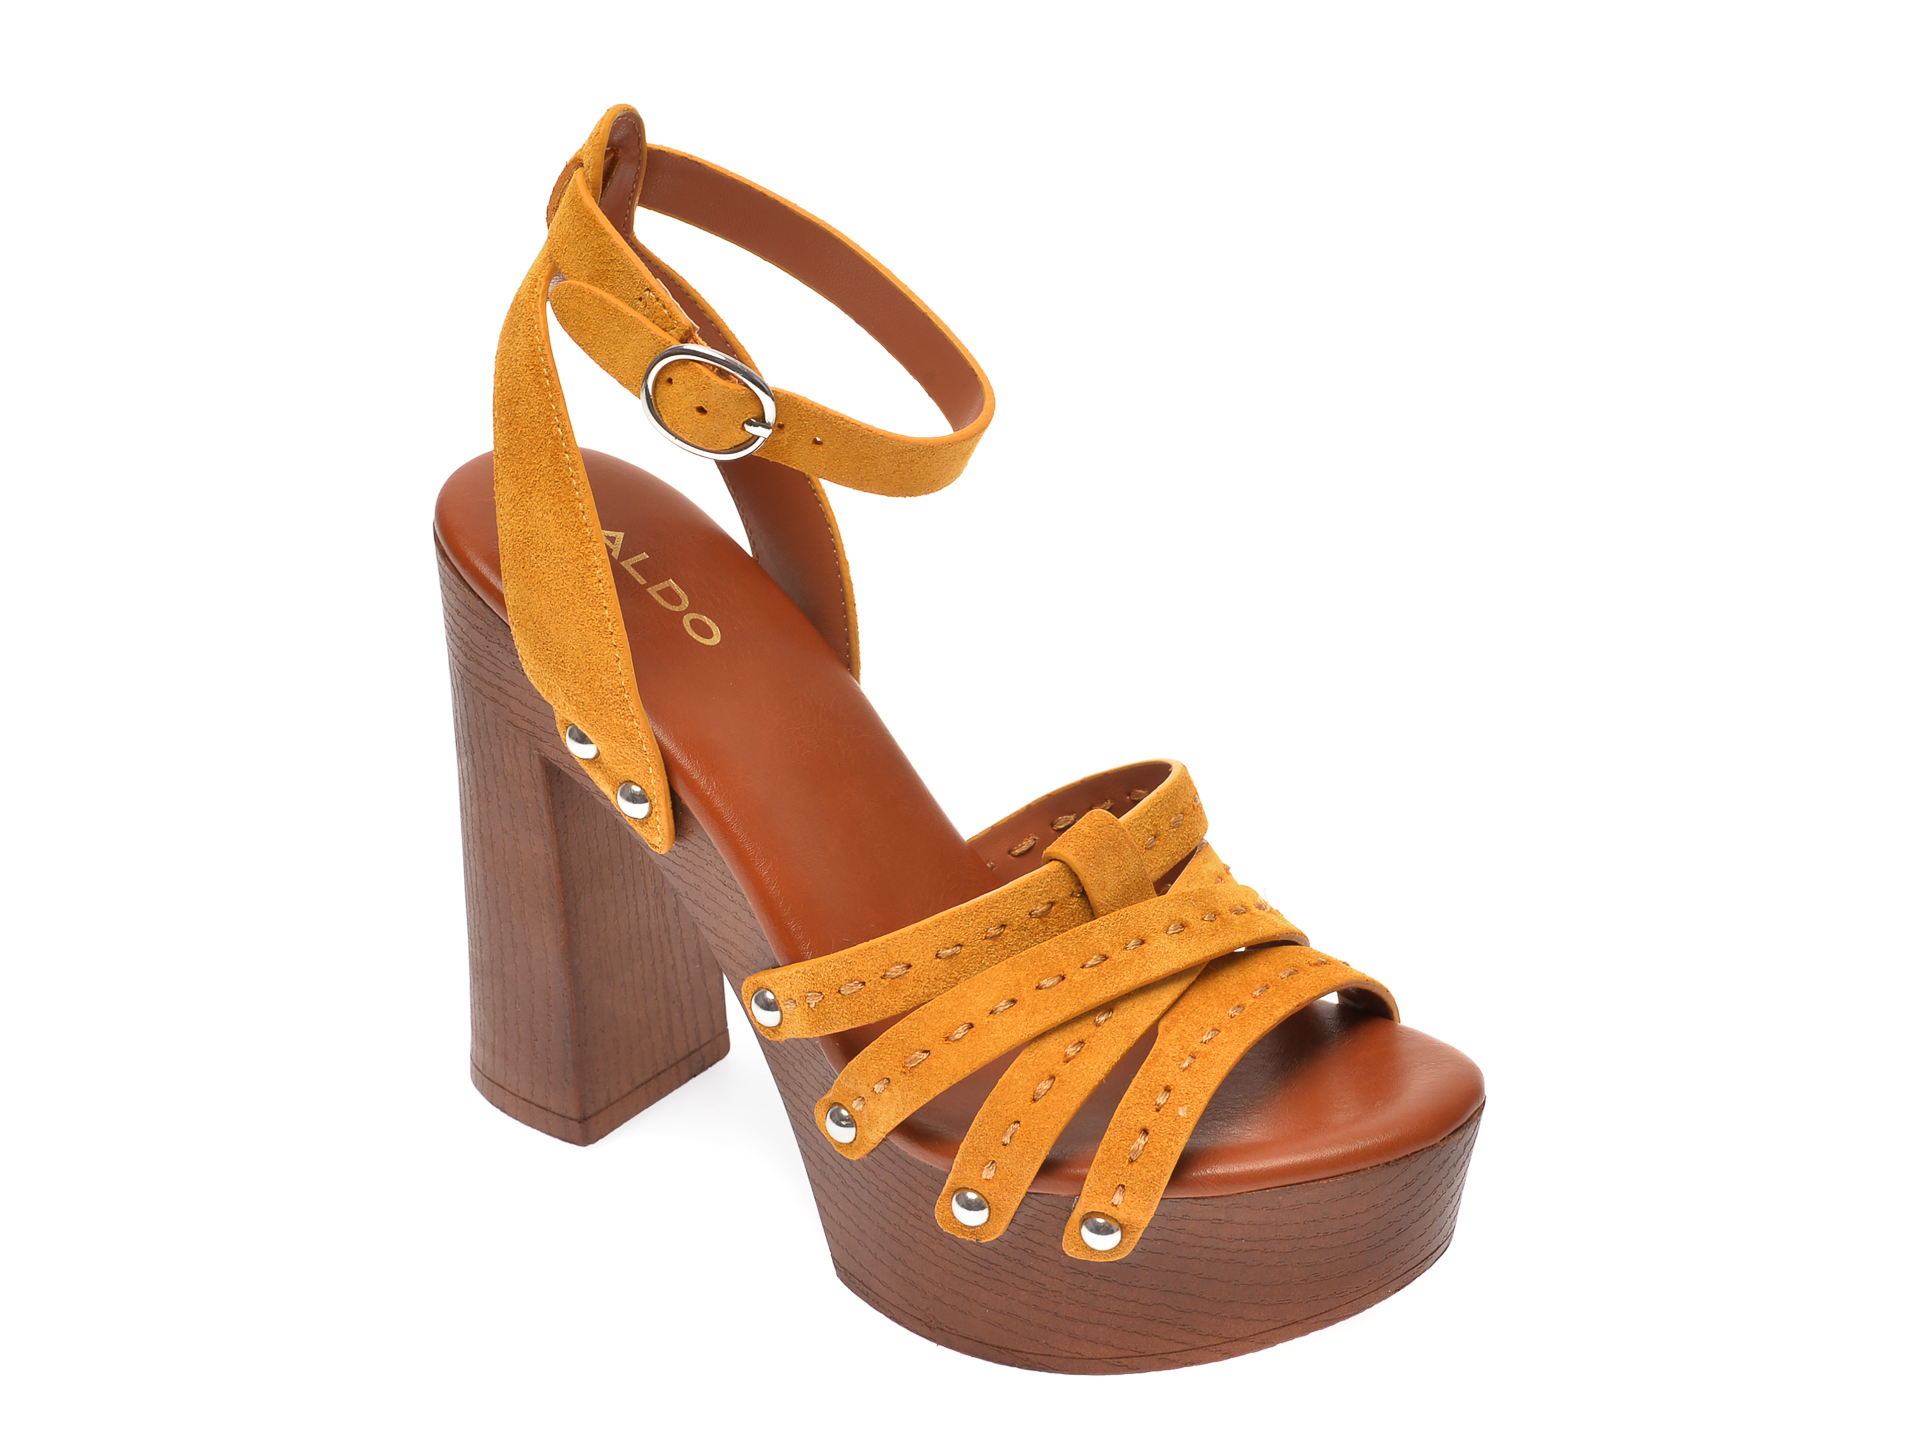 Sandale ALDO galbene, Hendra700, din piele intoarsa